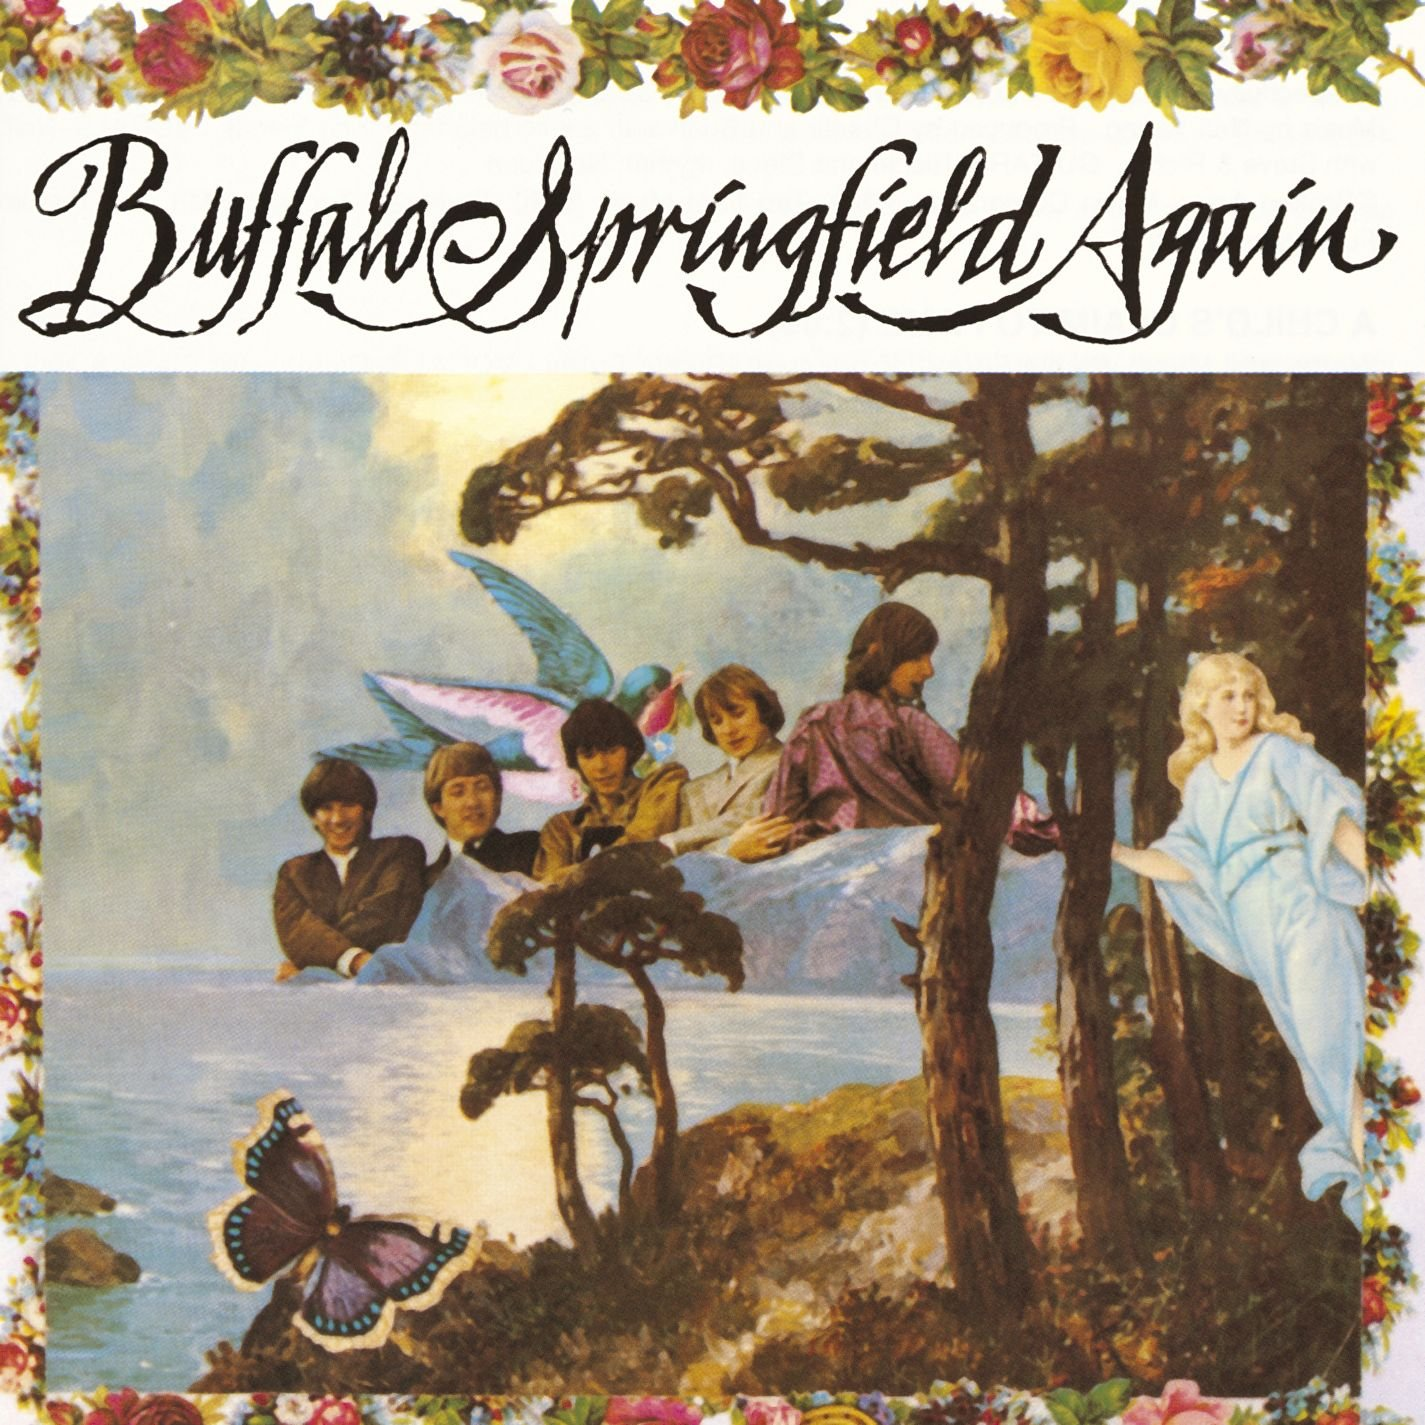 Buffalo Springfield - Buffalo Springfield Again - Amazon.com Music